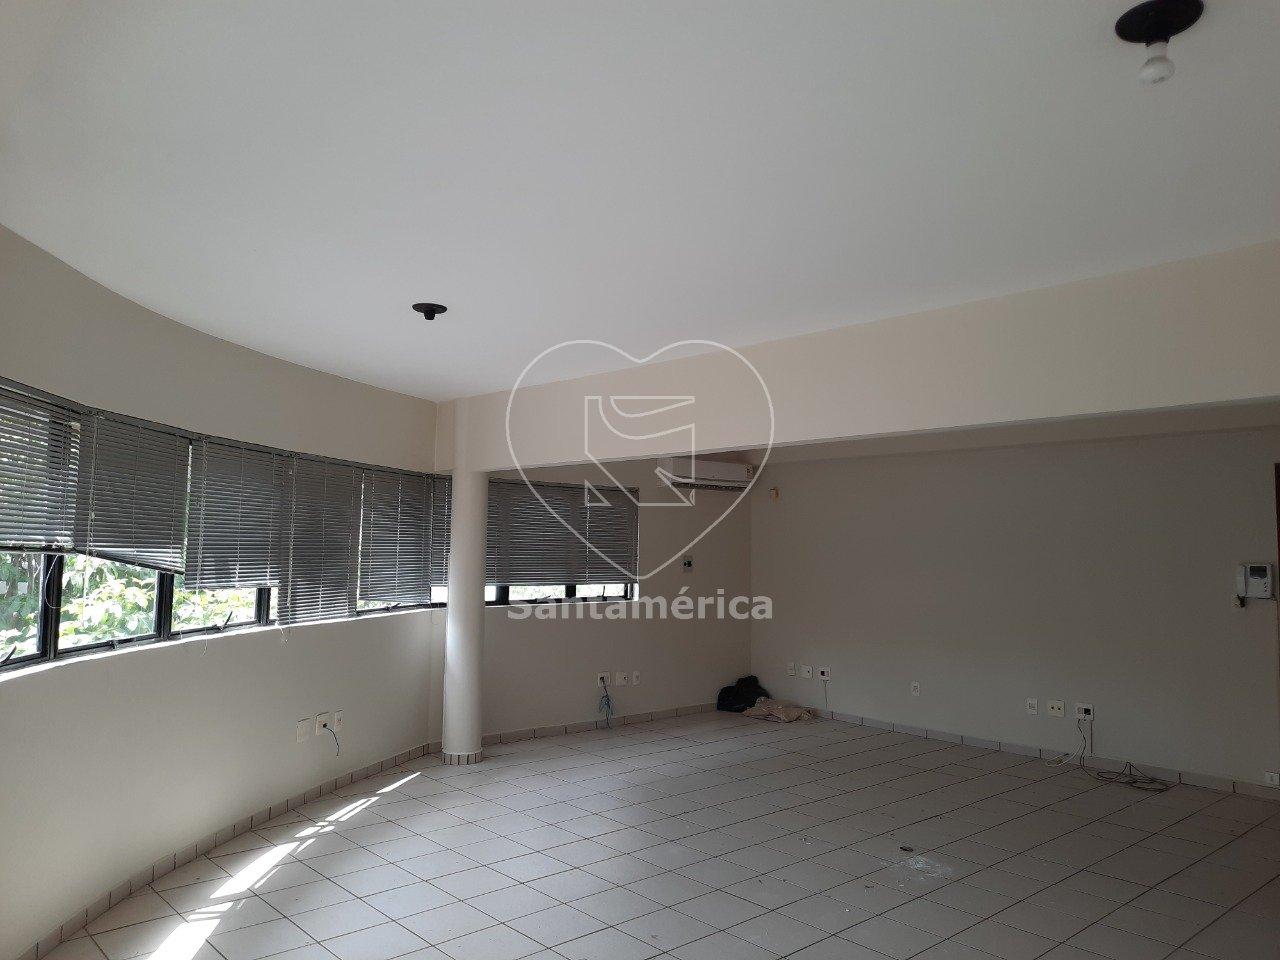 15884.003, Salas/Conjuntos, 48 m² para alugar no Vila Ipiranga - Londrina/PR